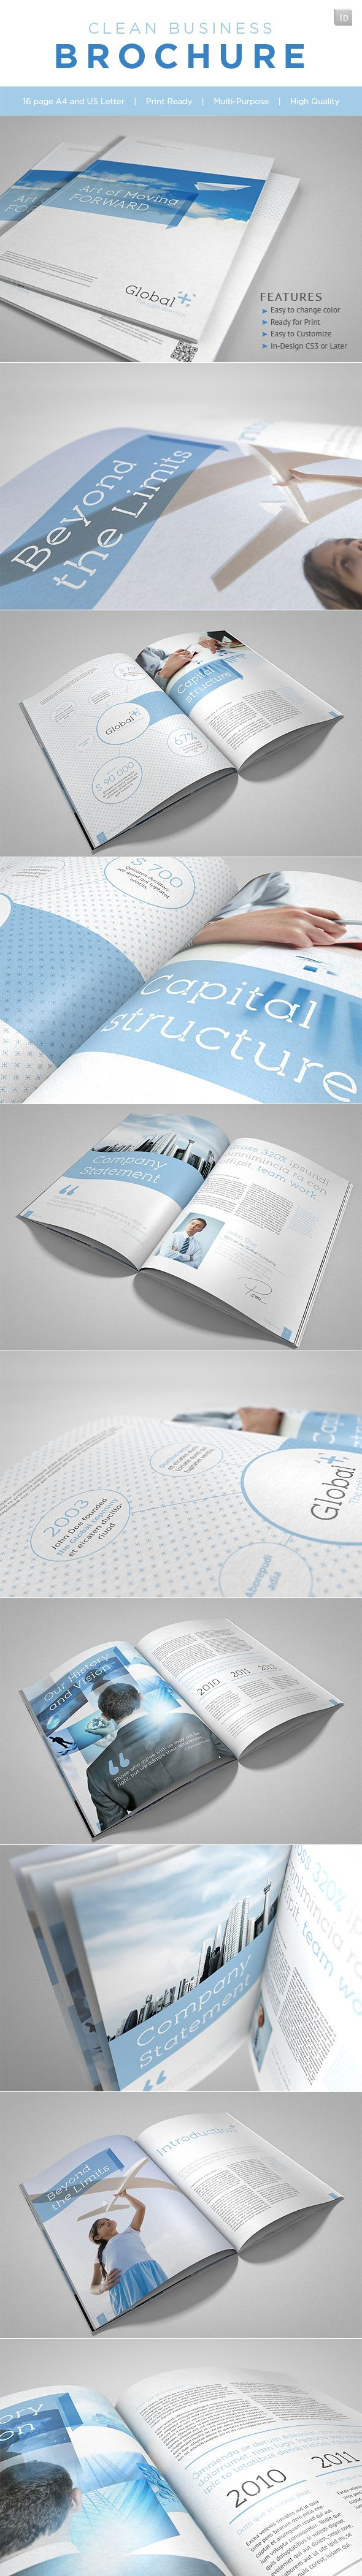 Clean Business Brochure - http://www.bce-online.com/en/shop/printed-paper-products.html